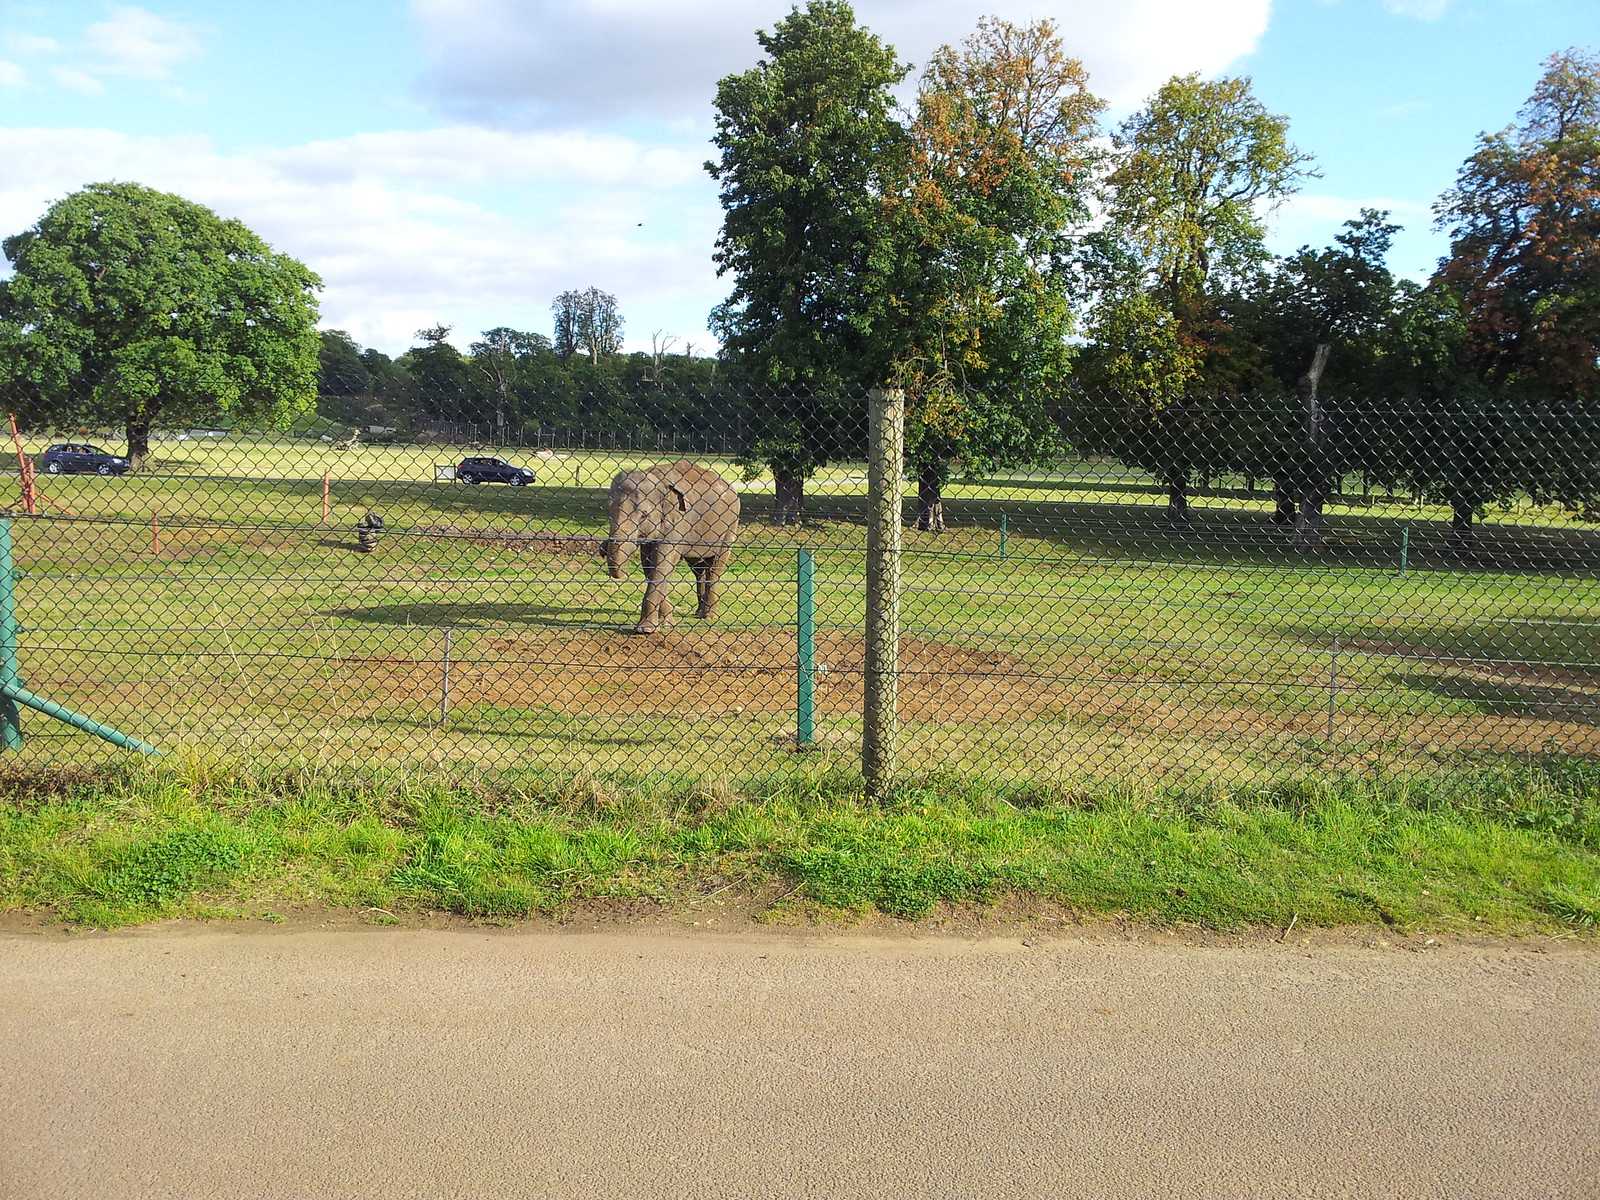 2012-09-29 16.06.09 Elephant